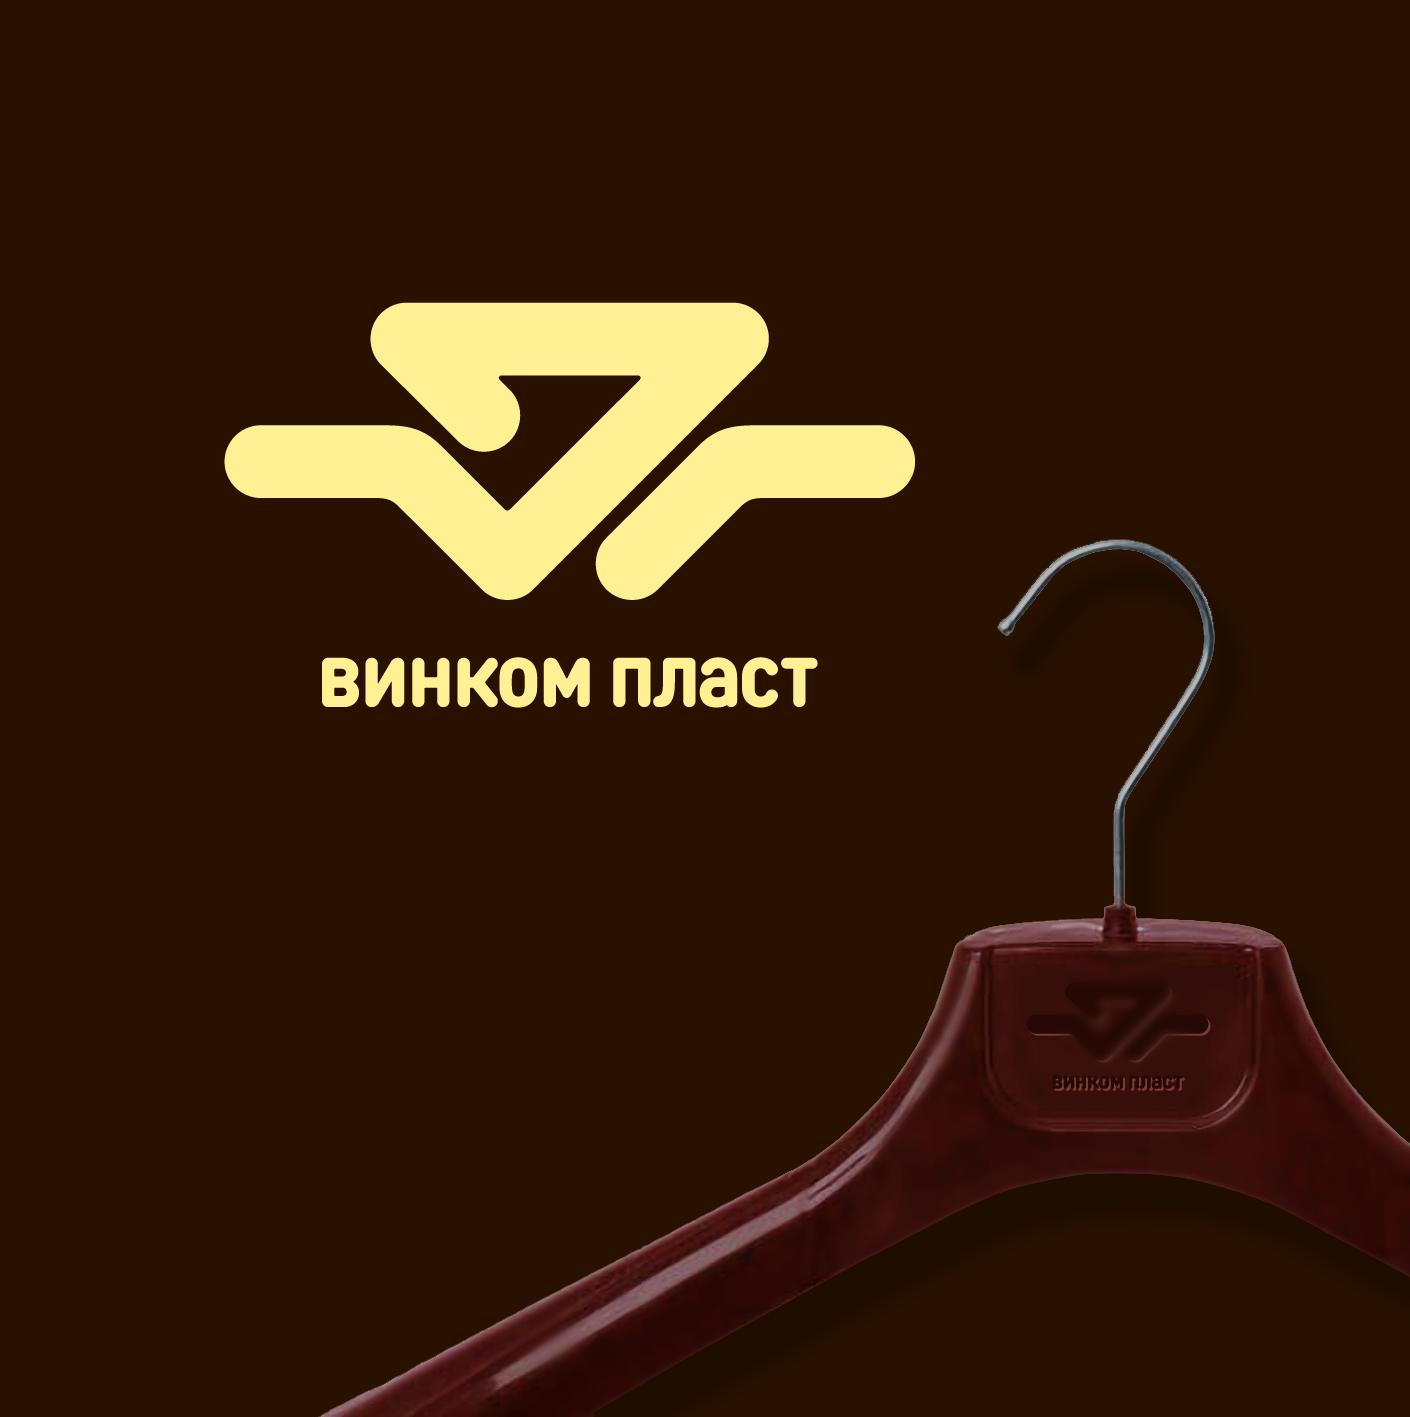 Логотип, фавикон и визитка для компании Винком Пласт  фото f_9805c3dad1ab5f5f.png